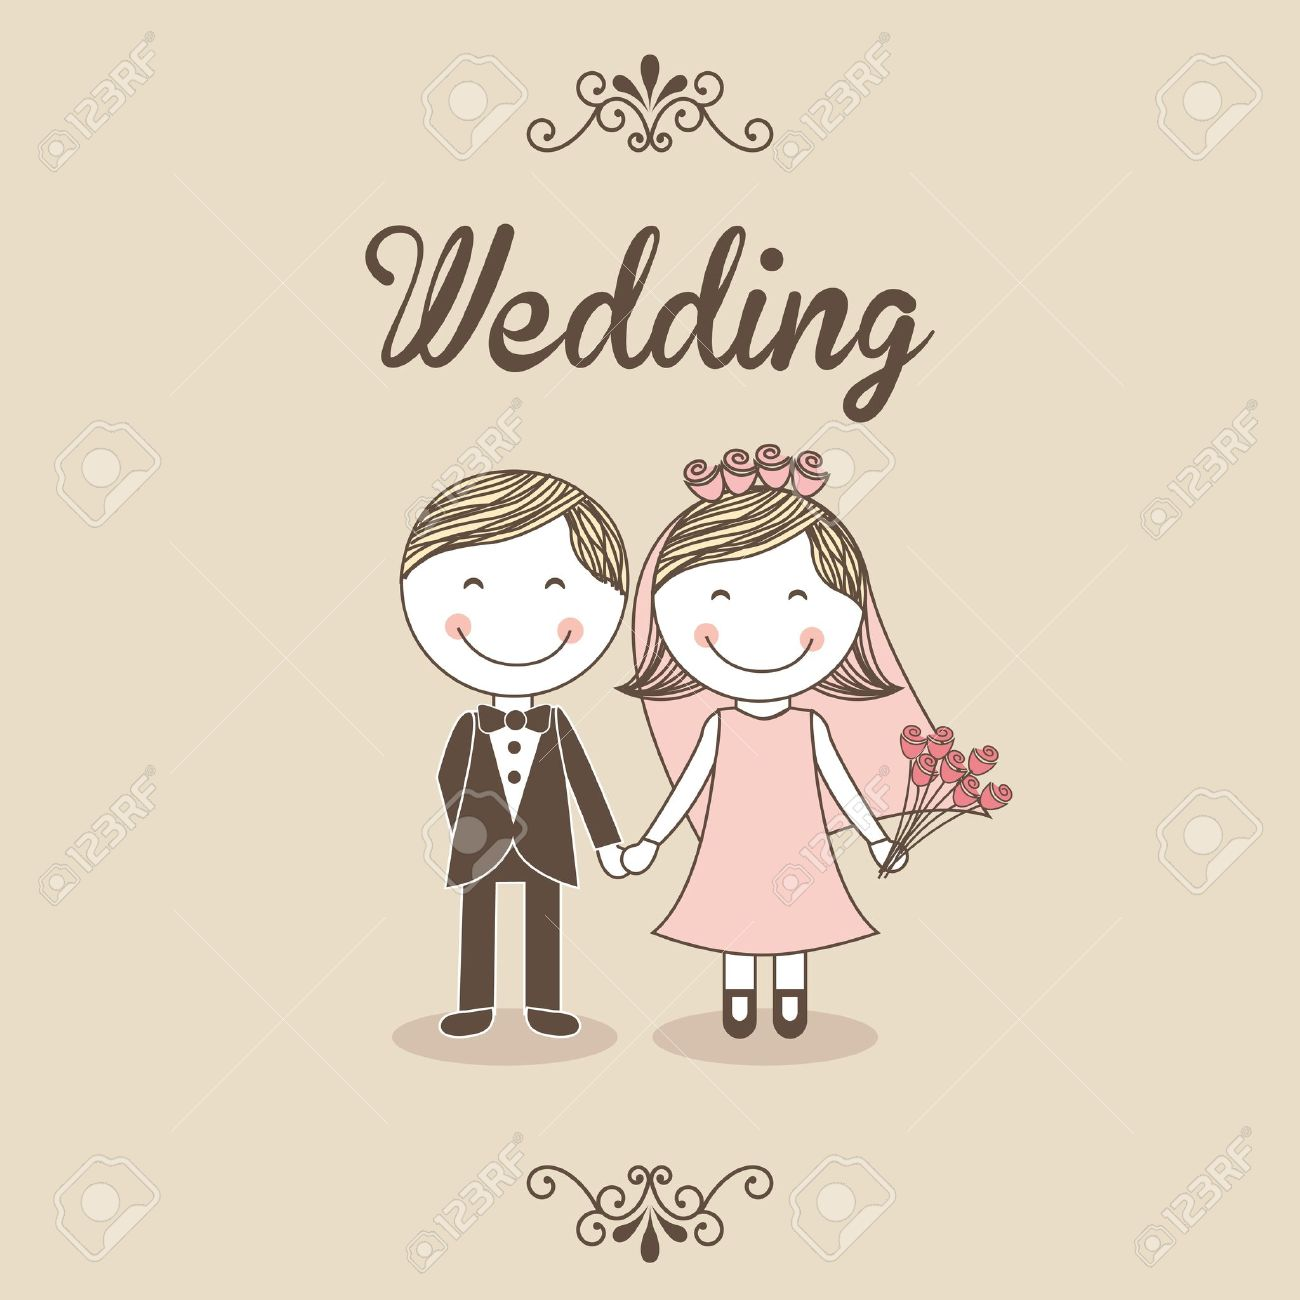 Wedding Design Over Pink Background